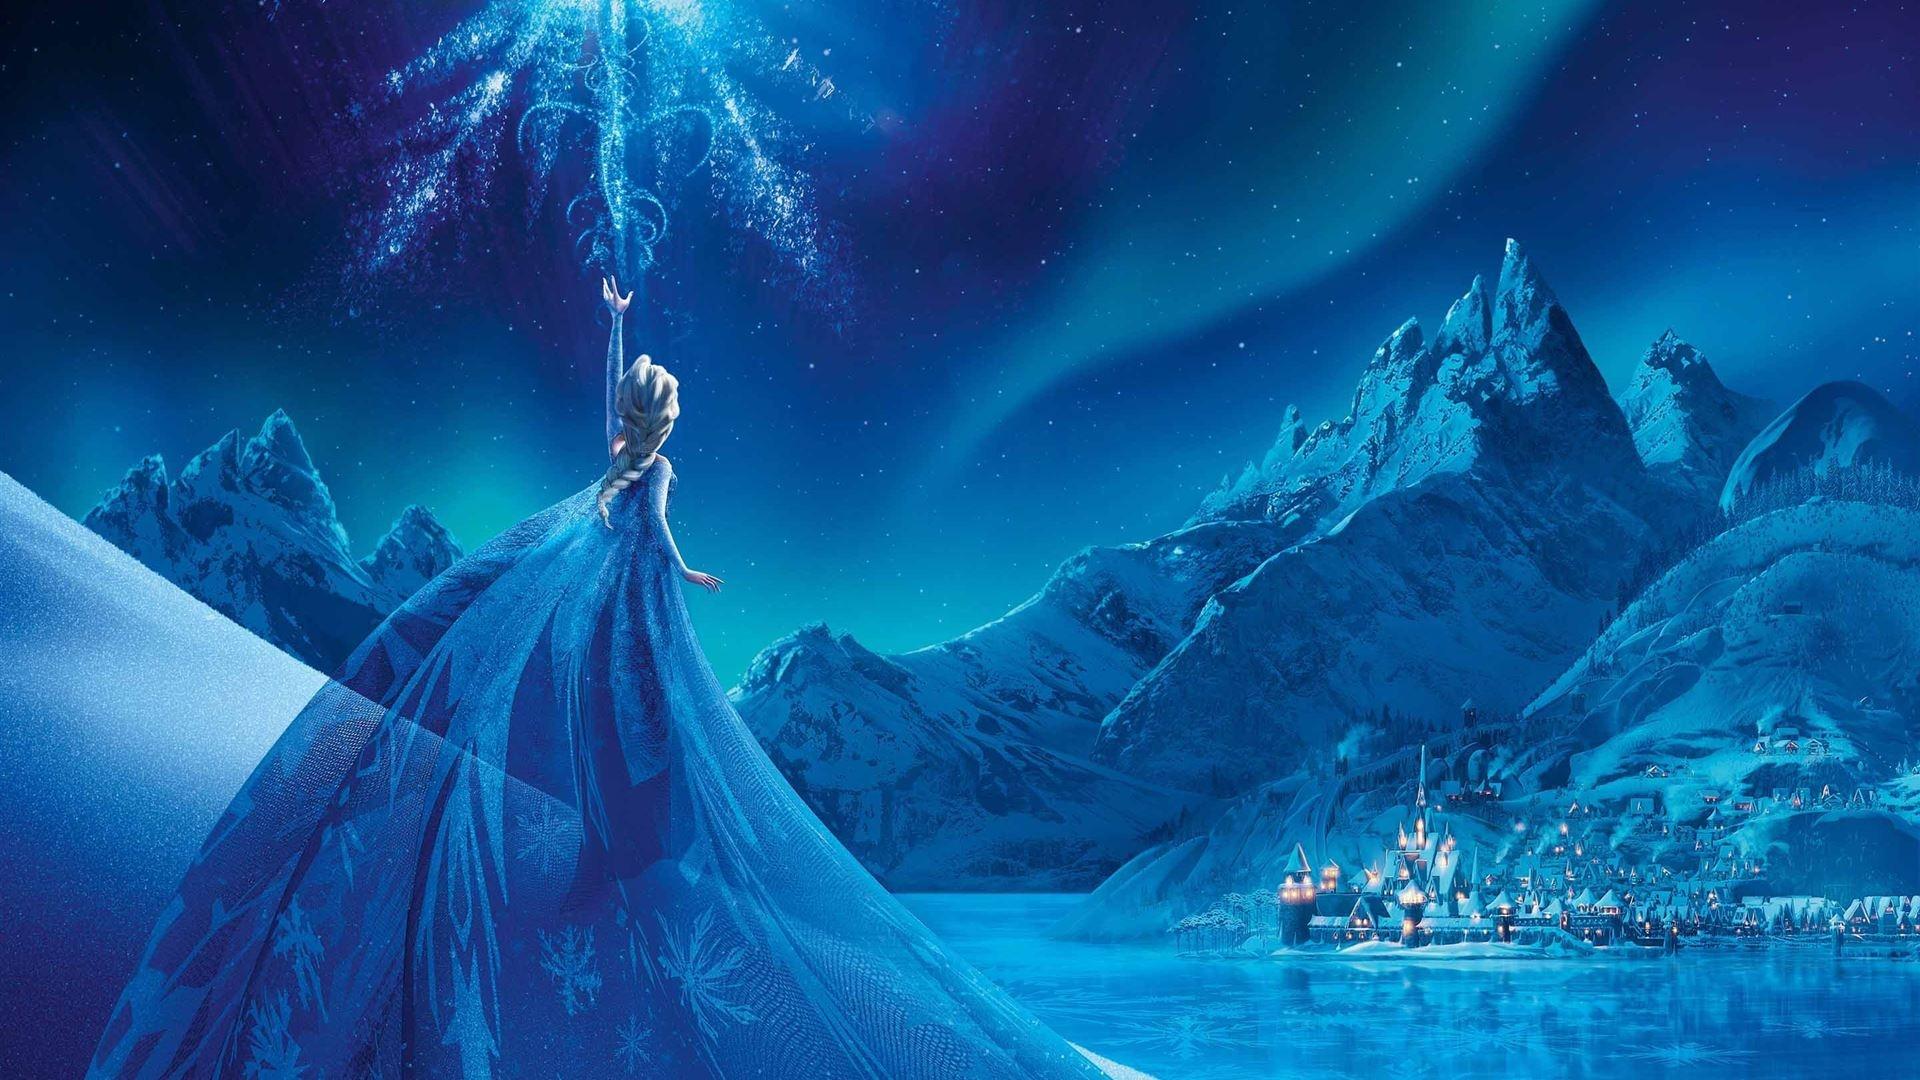 Disney best wallpaper